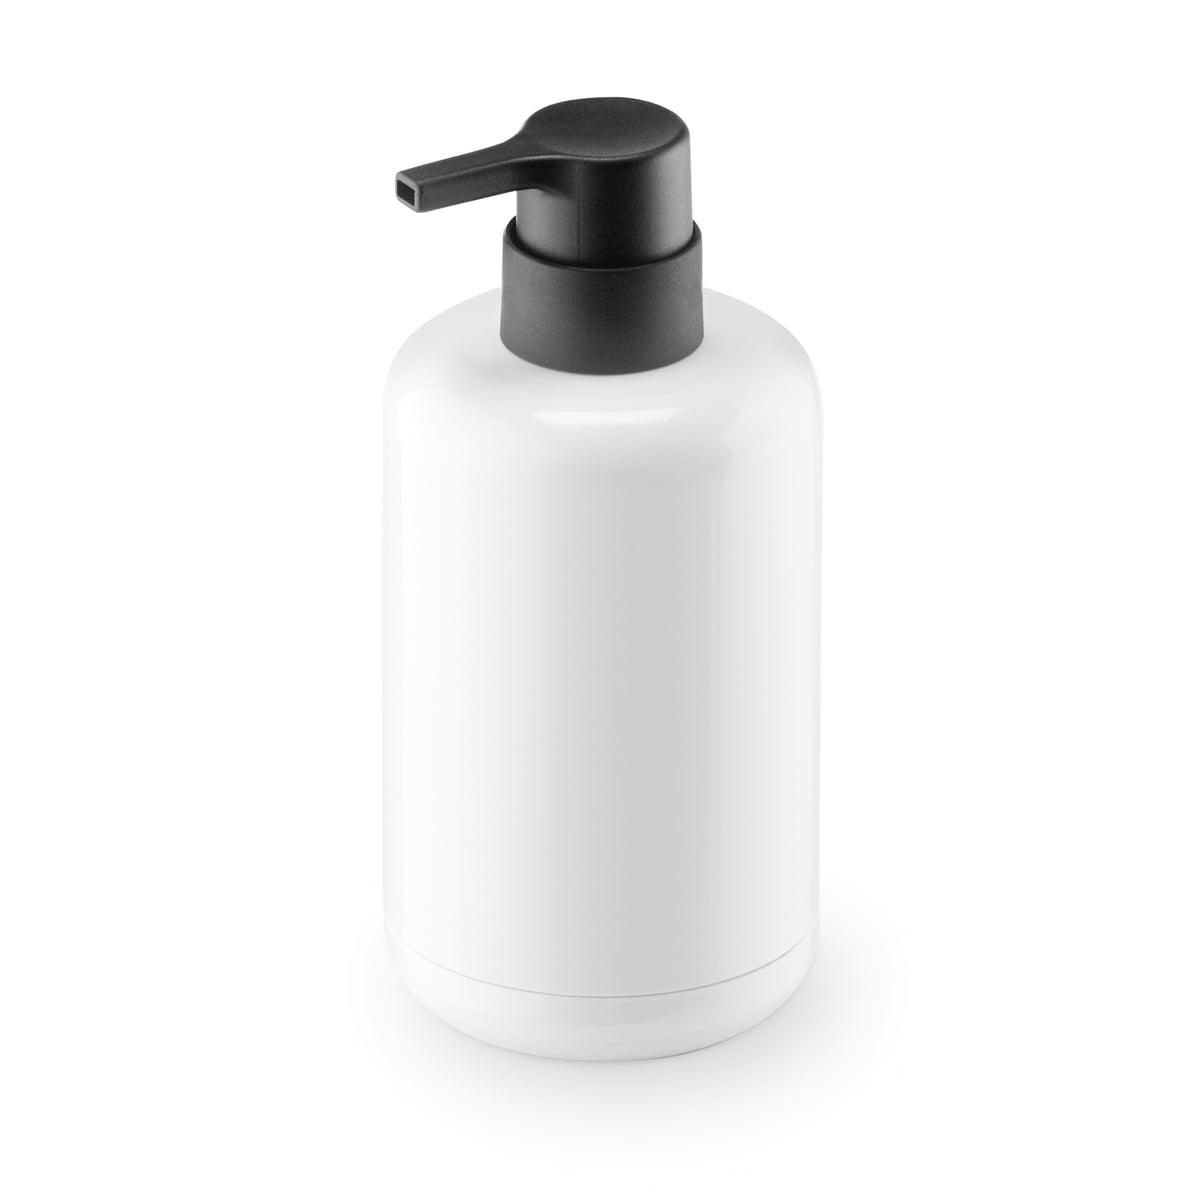 Lunar Soap Dispenser By Authentics In White Black